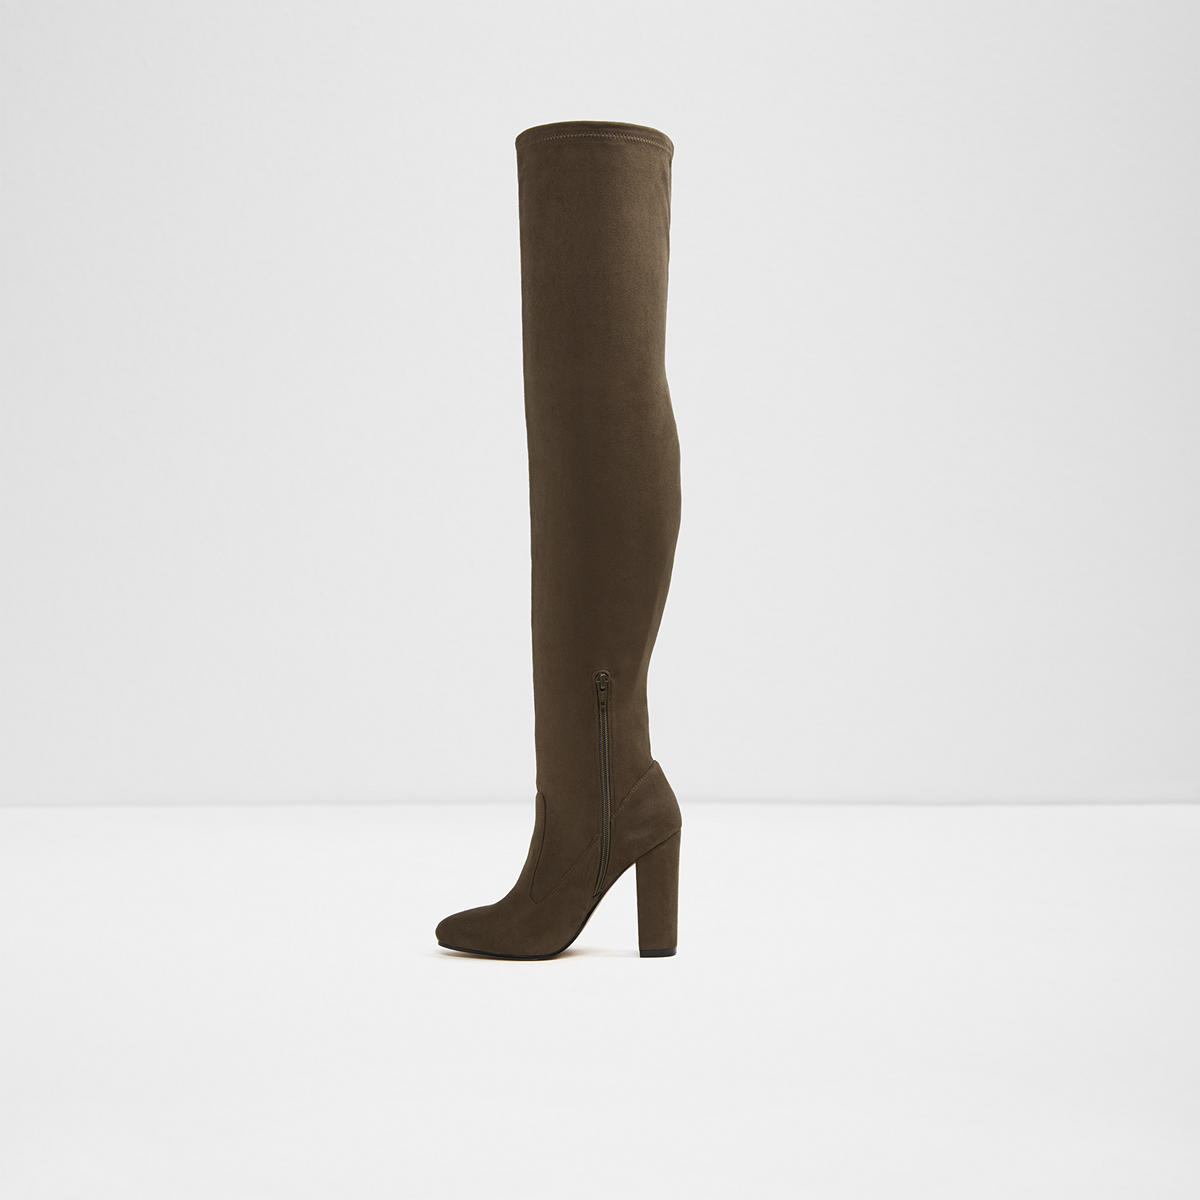 1b0e47c5a46 Sumers Khaki Women s Boots